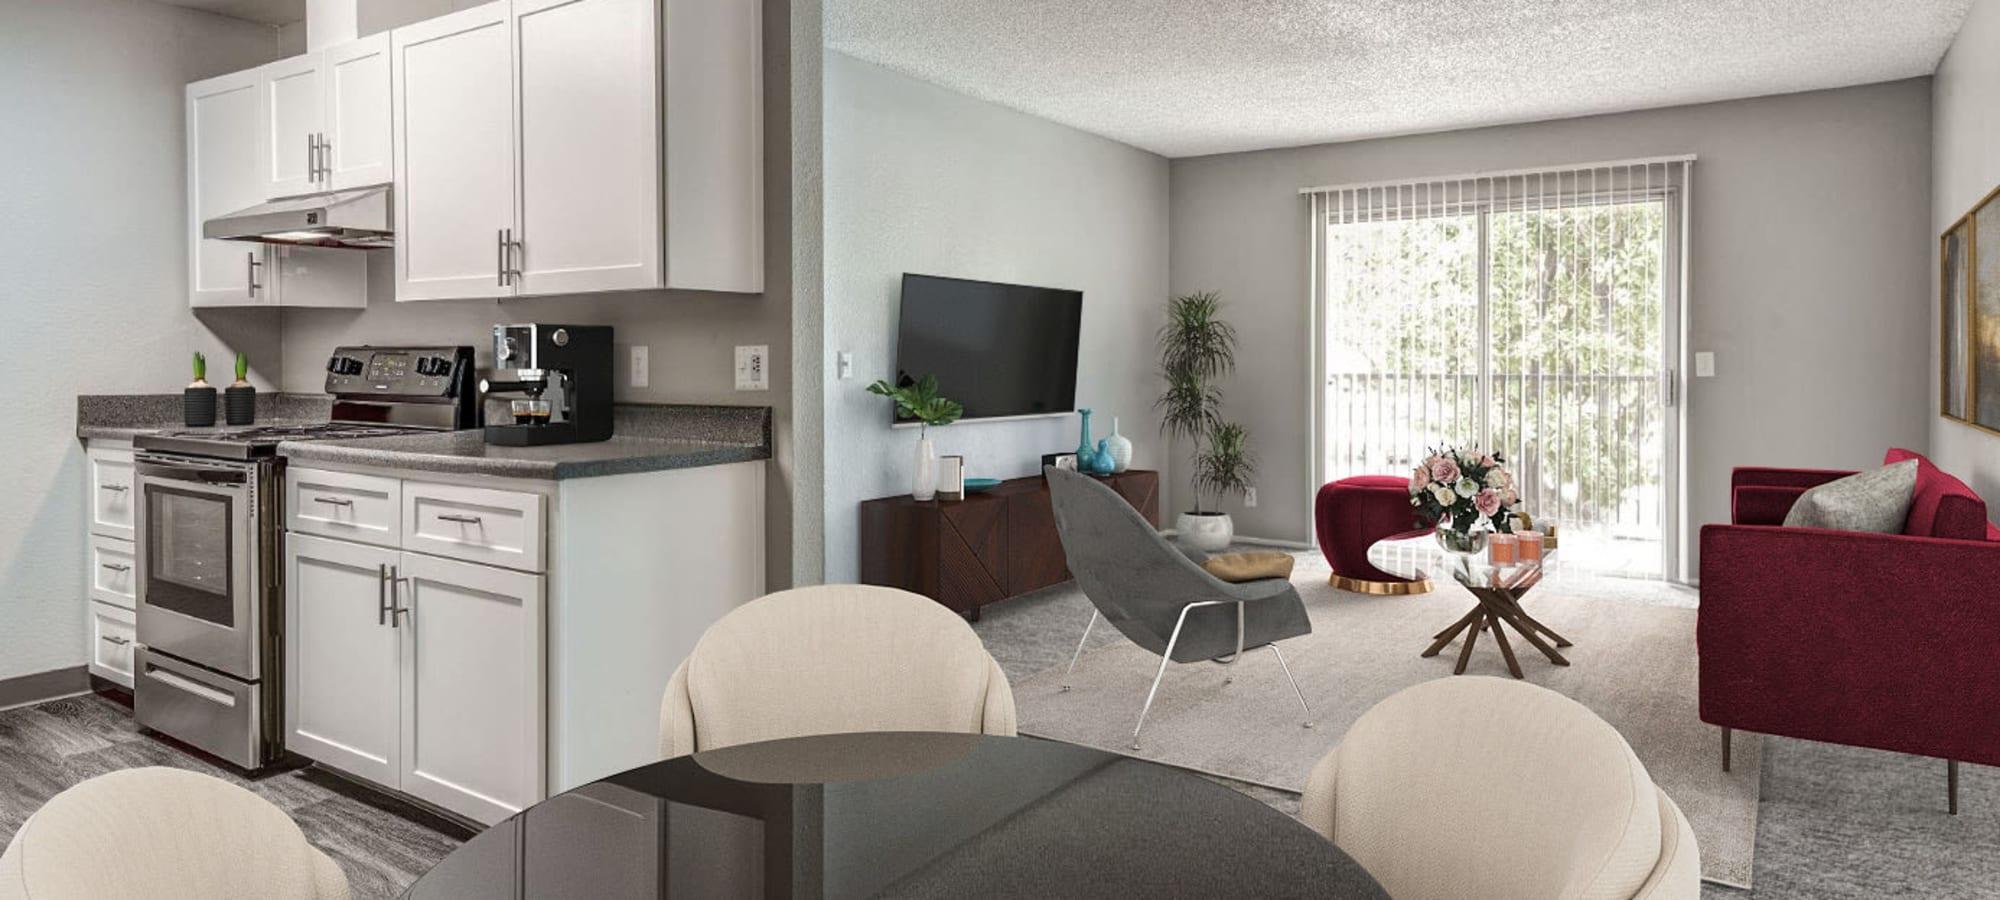 Sacramento, California apartments at The Woodlands Apartments